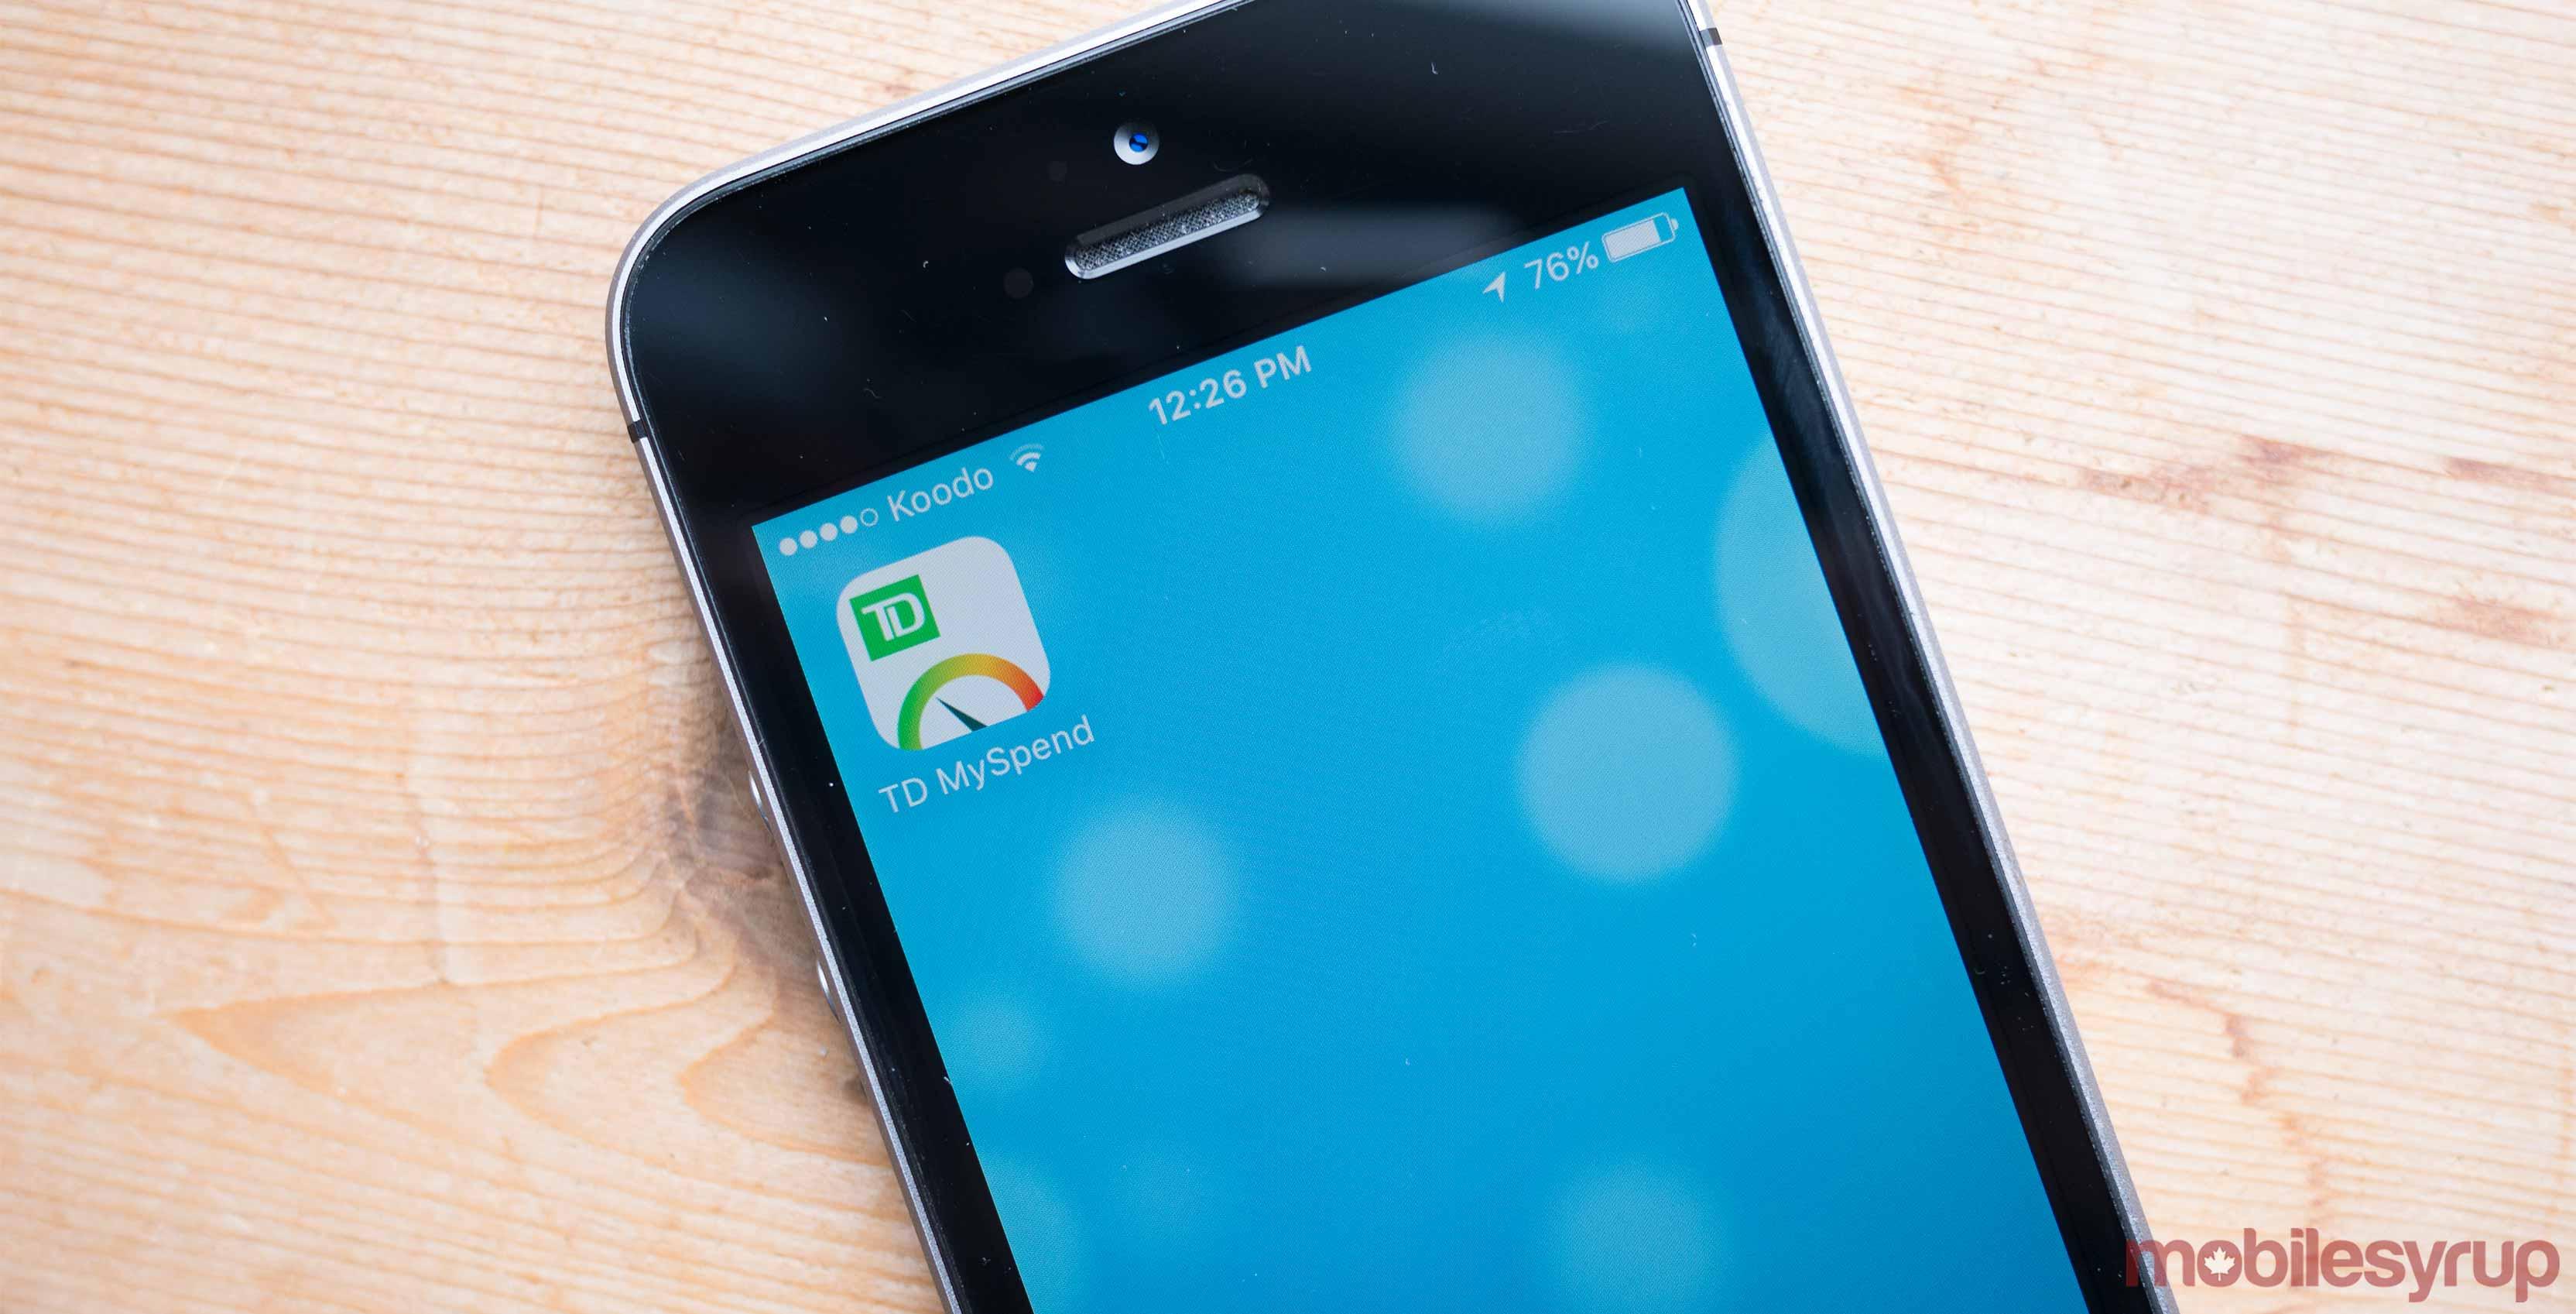 TD app photo